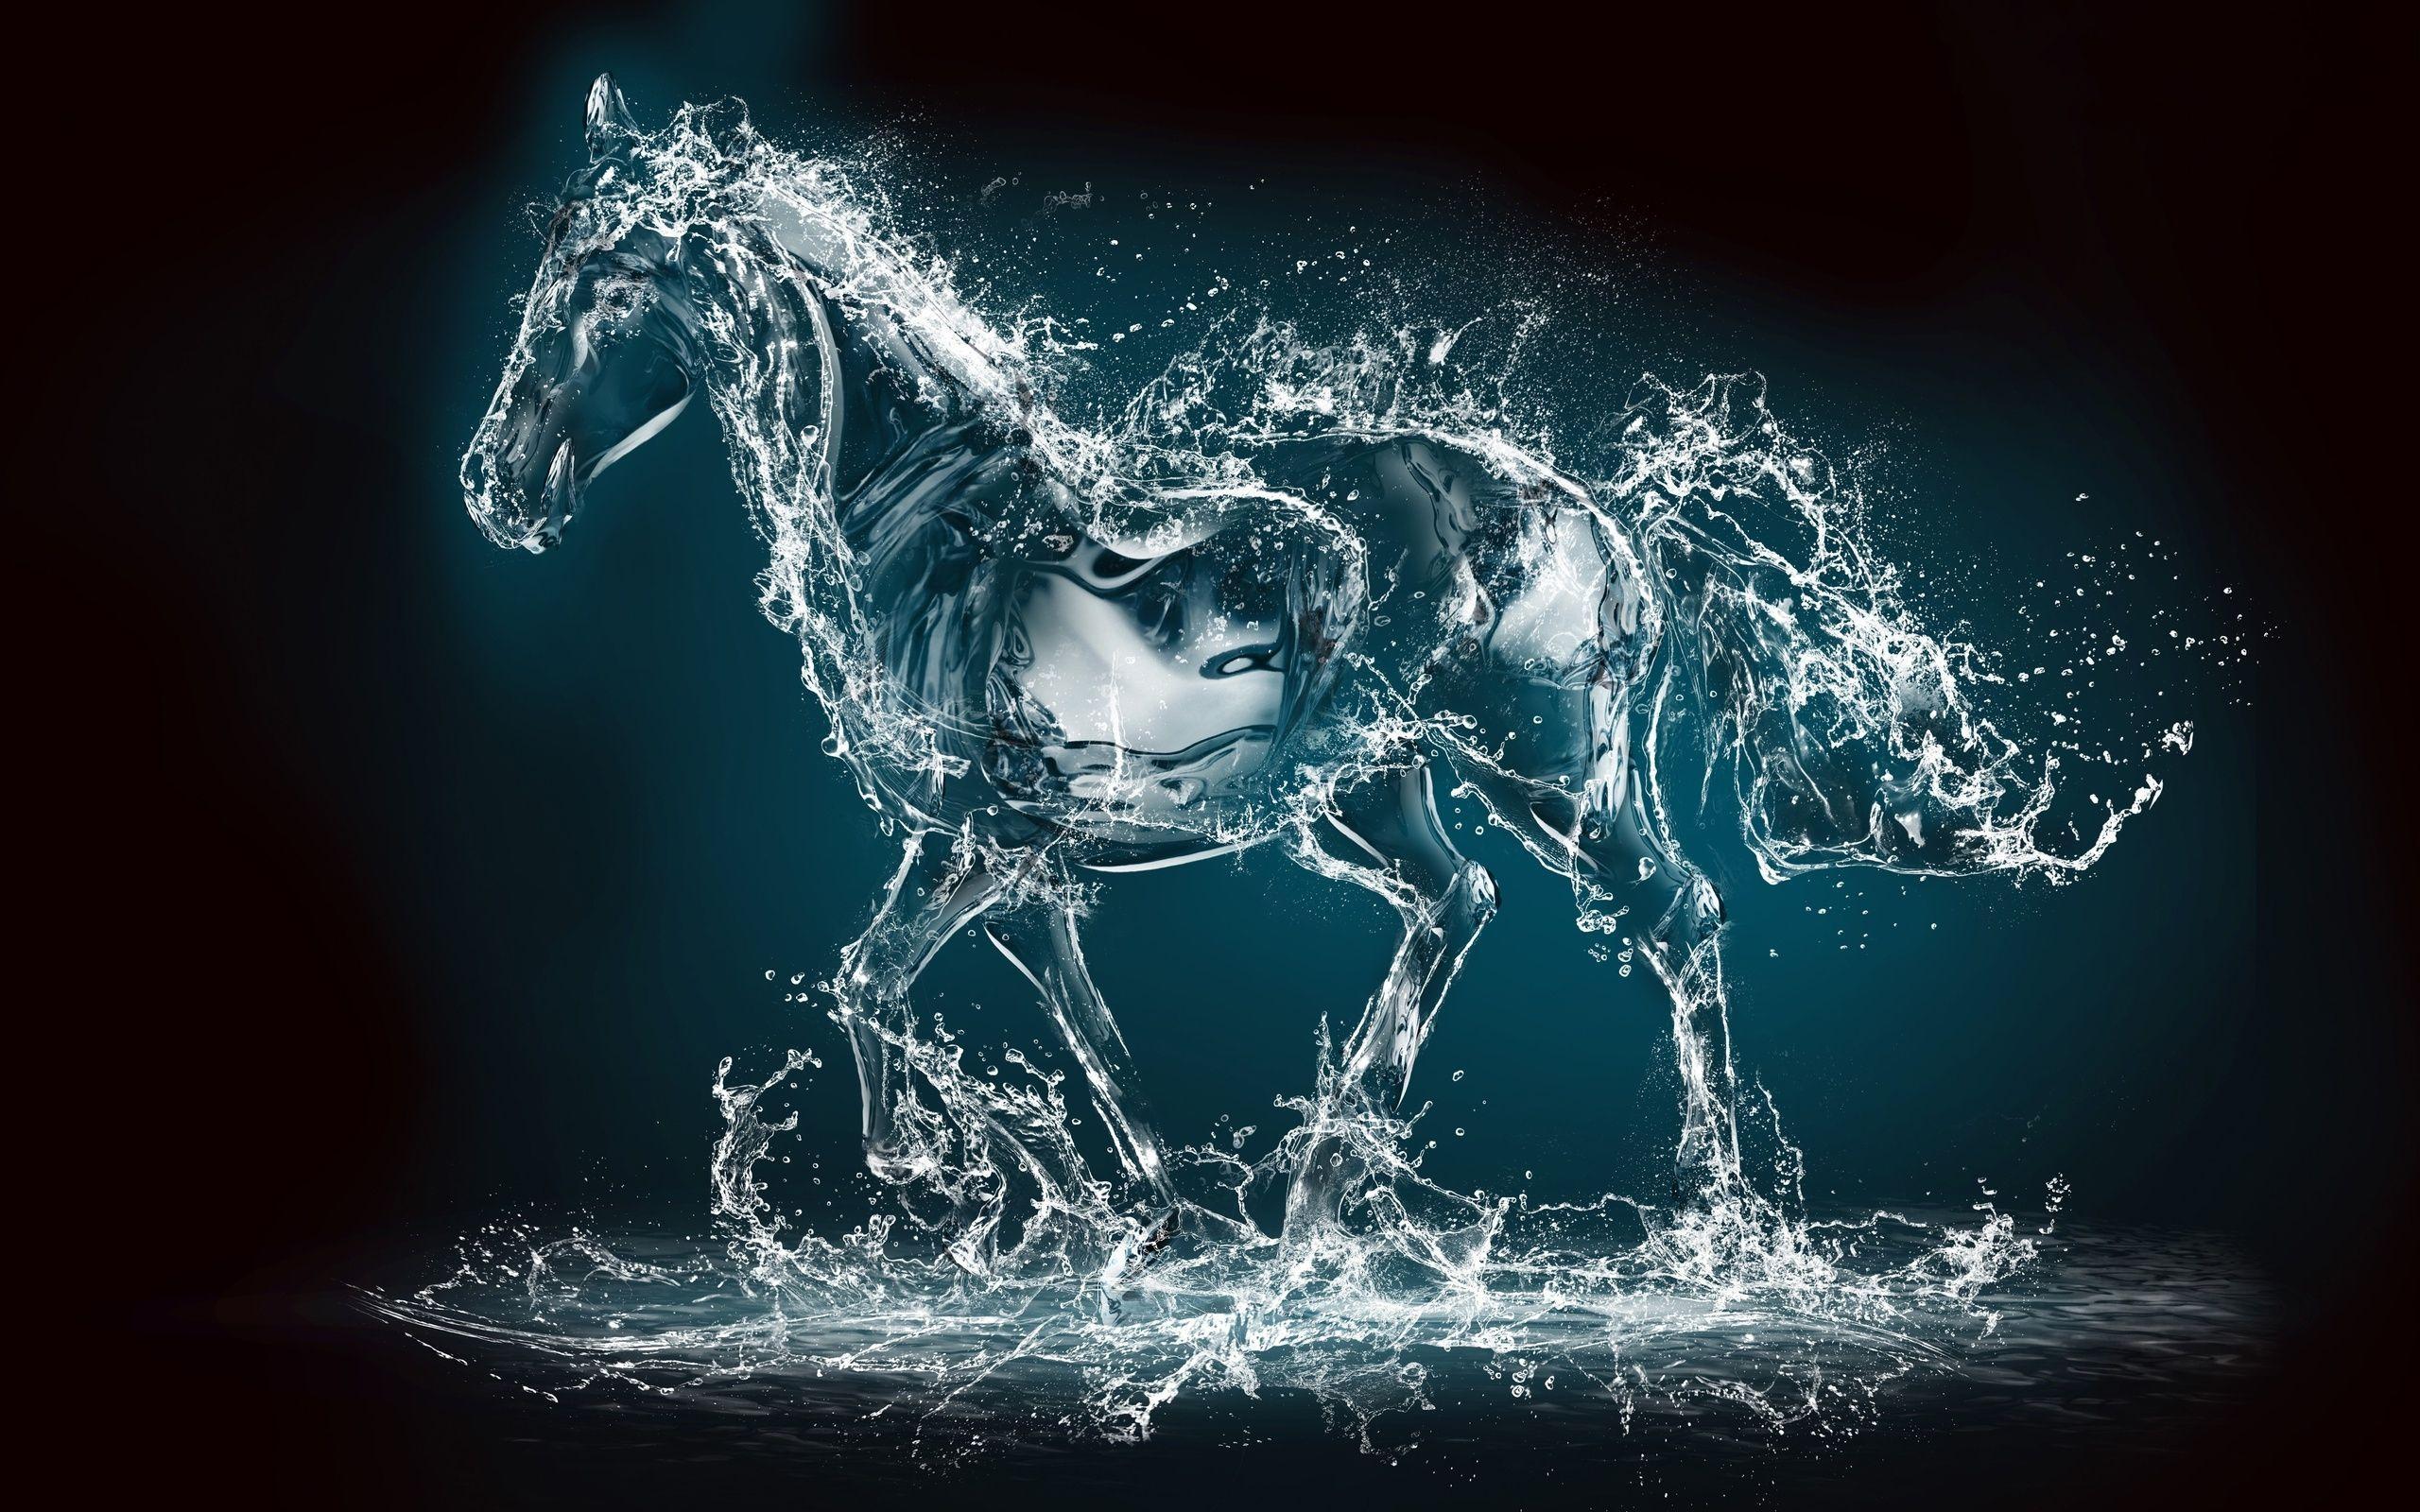 3d Fire Horse Wallpapers Top Free 3d Fire Horse Backgrounds Wallpaperaccess